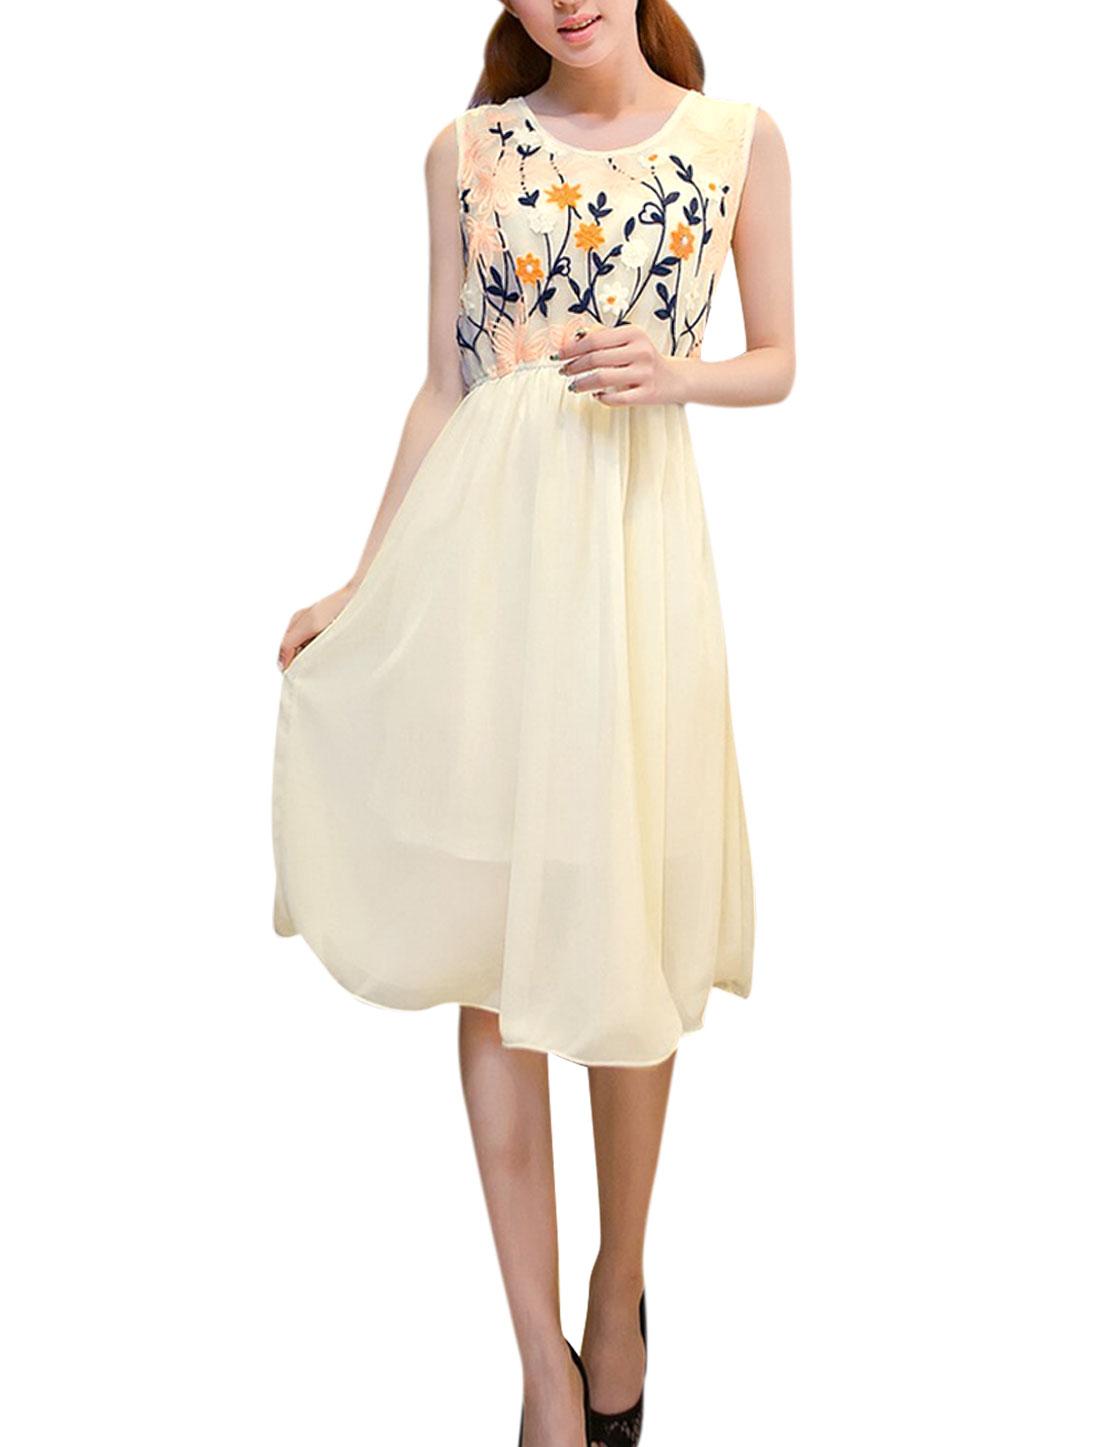 Woman Chic Crochet Flower Design Semi-Sheer Hollow Back Beige Dress S